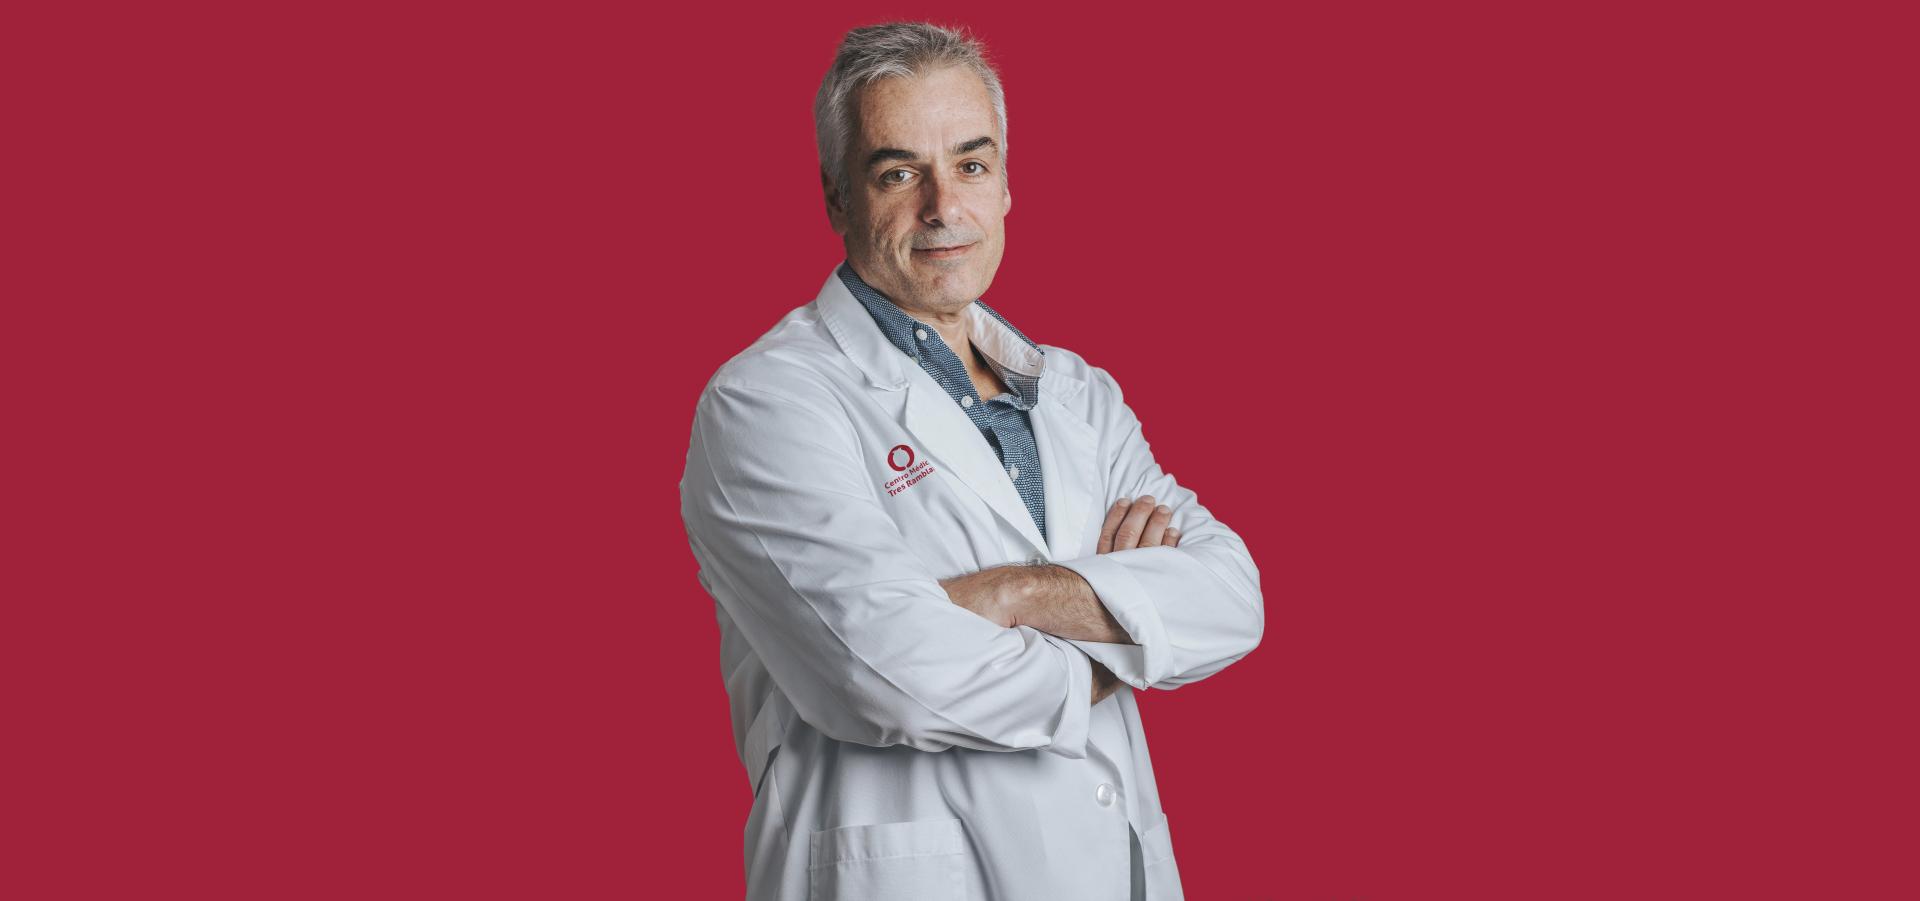 Dr. Alejandro Sánchez Acosta